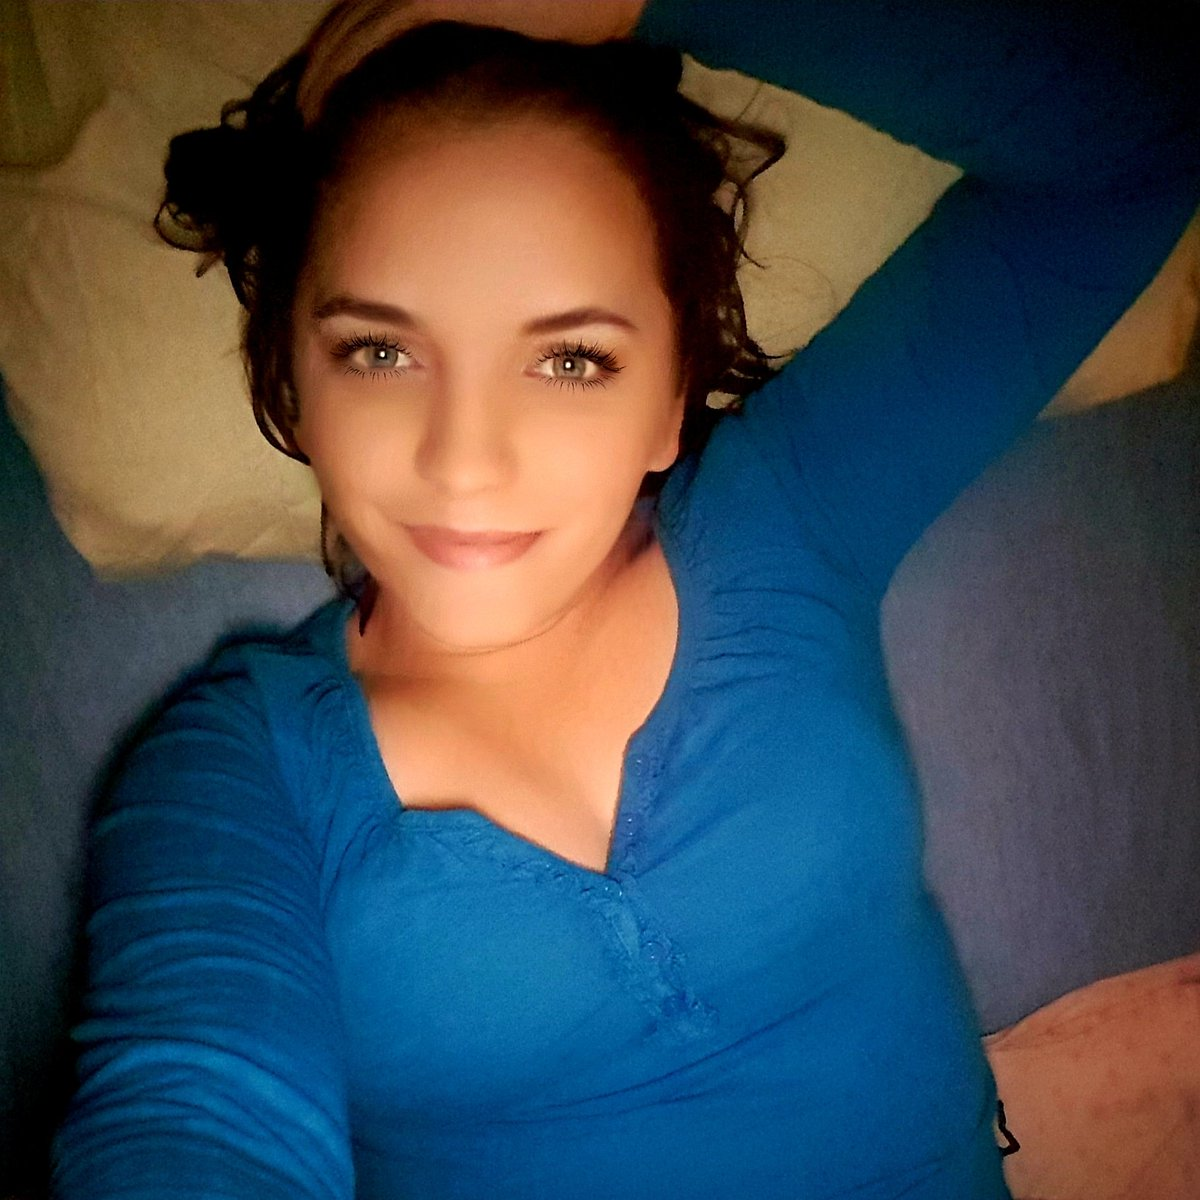 HI  . . . #itsme #life #braunehaare #blaueaugen #germany #insta #instalife #love #mood #tattoo #photography #selfie #blueeyes #brownhairpic.twitter.com/3fDzo89hrH